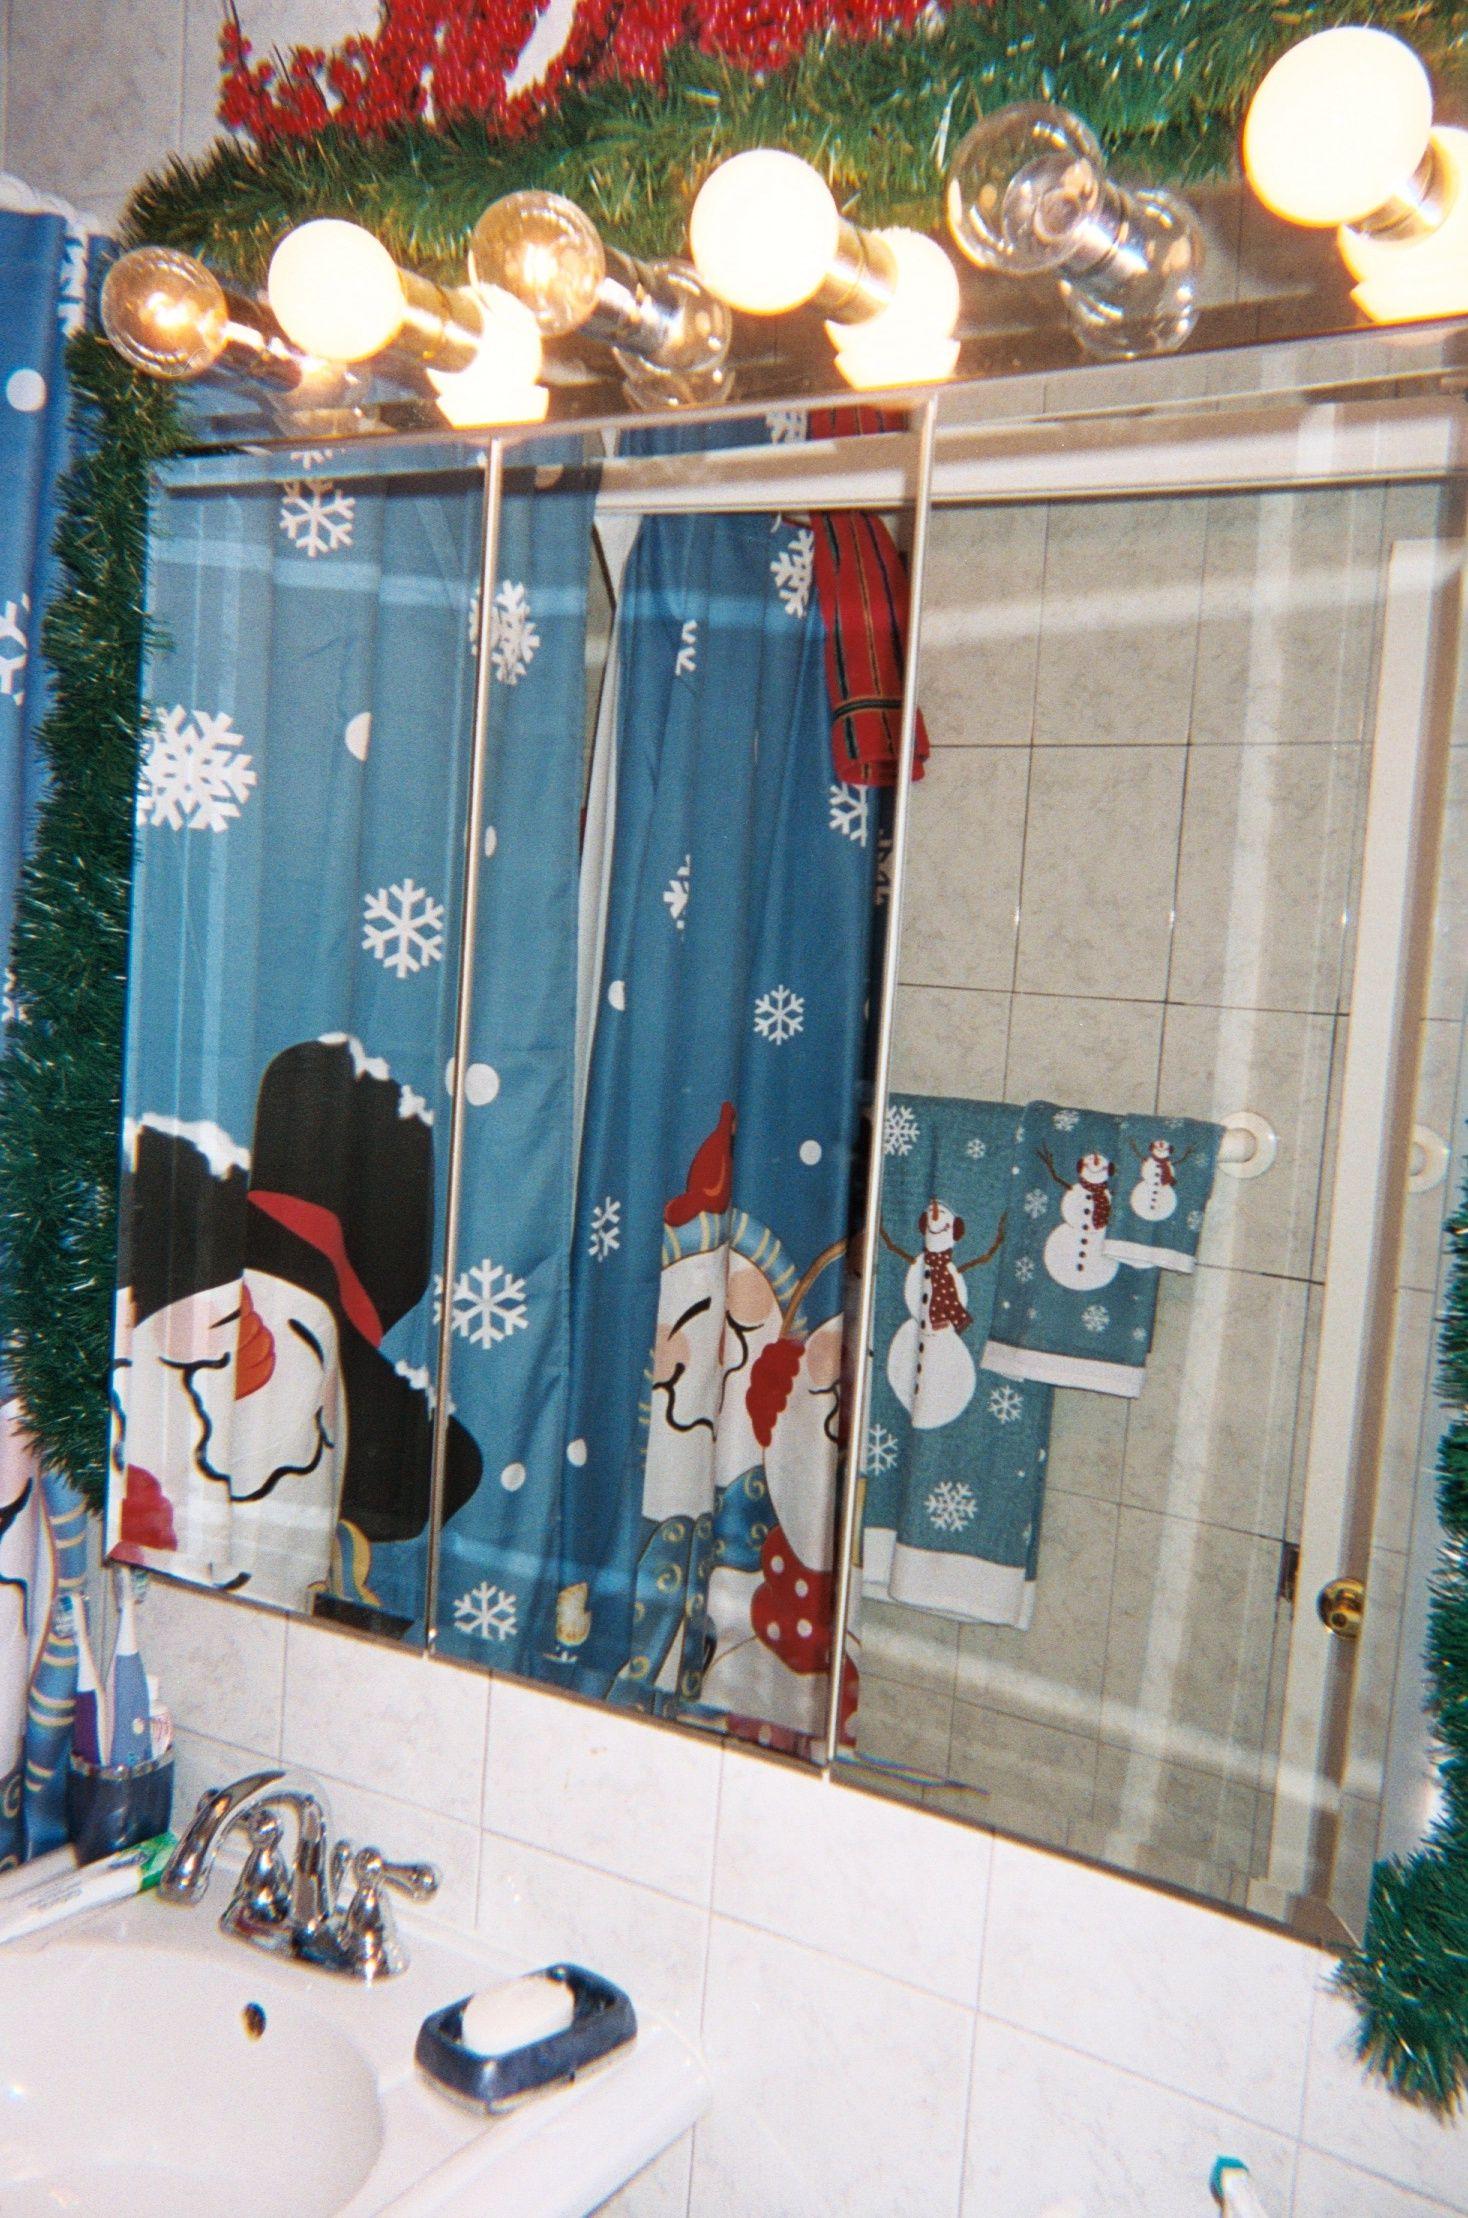 Christmas Decorations Bathroom Christmas decorations